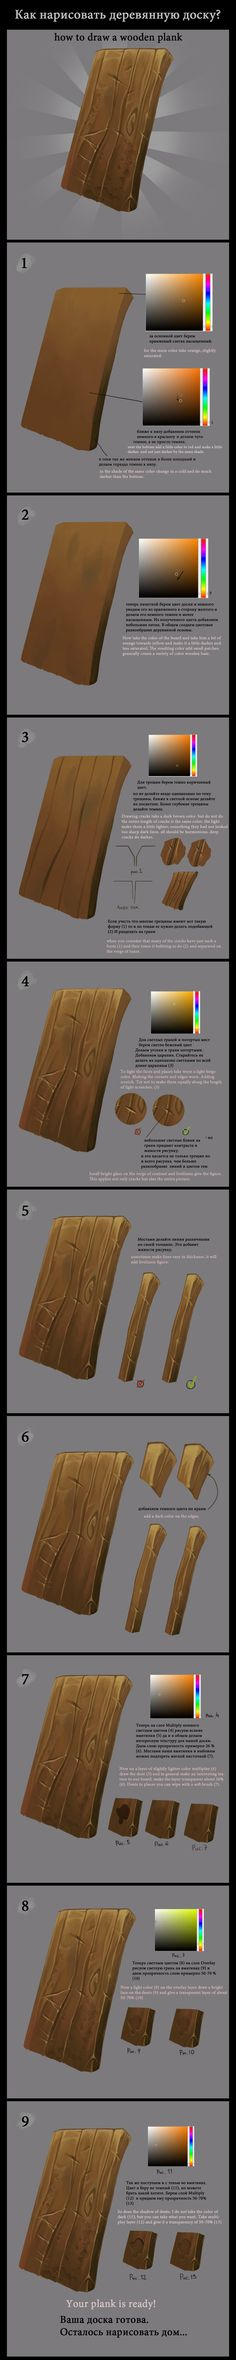 Drawn planks art DESIGN Wood ~Gimaldinov ★ to